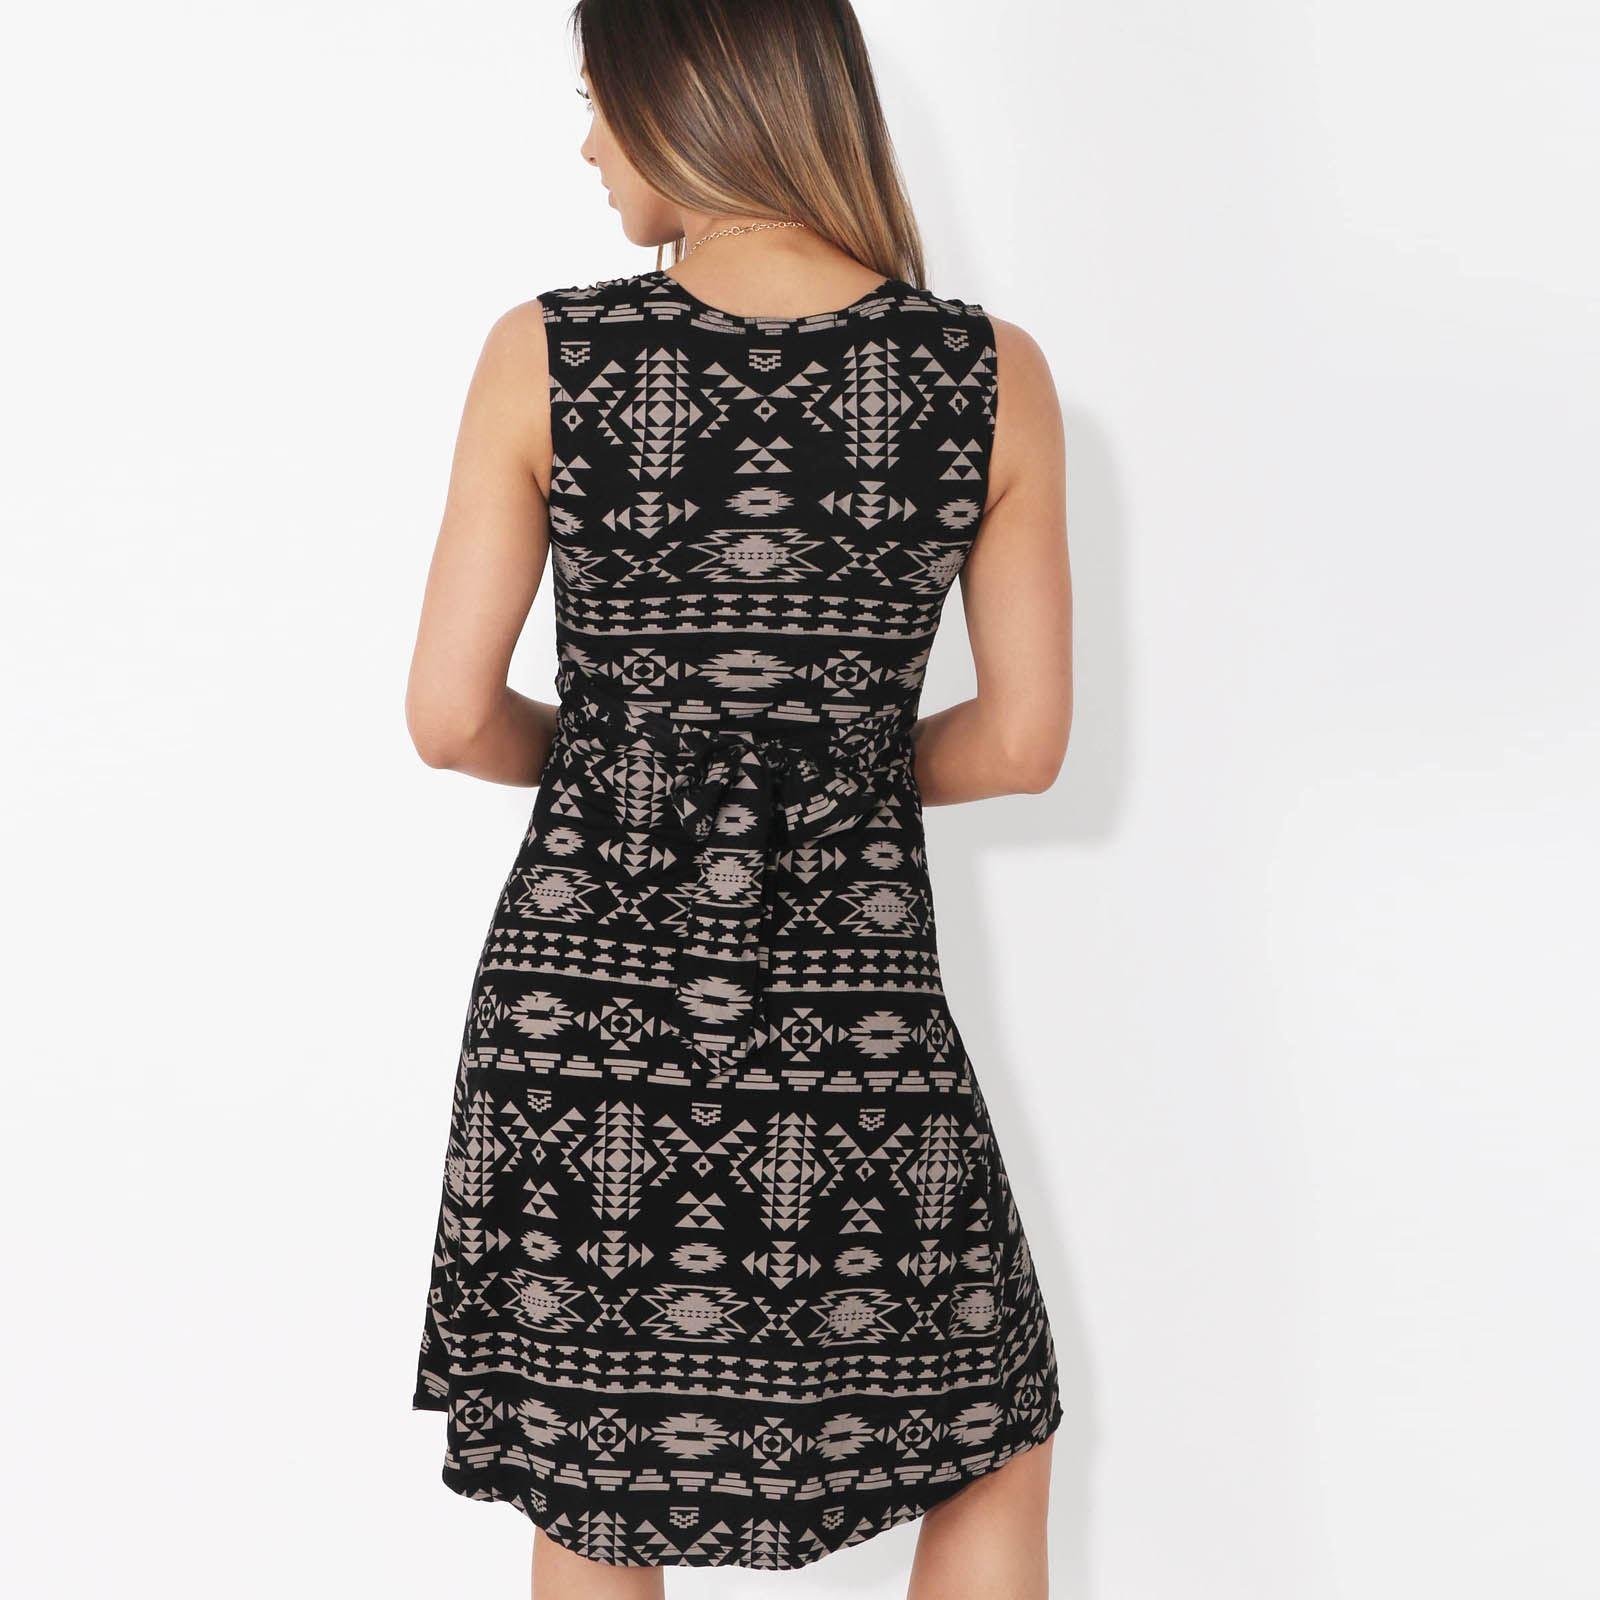 Womens-V-Neck-Mini-Dress-Small-Sizes-Short-Skirt-Tribal-Print-Front-Knot-Party thumbnail 10